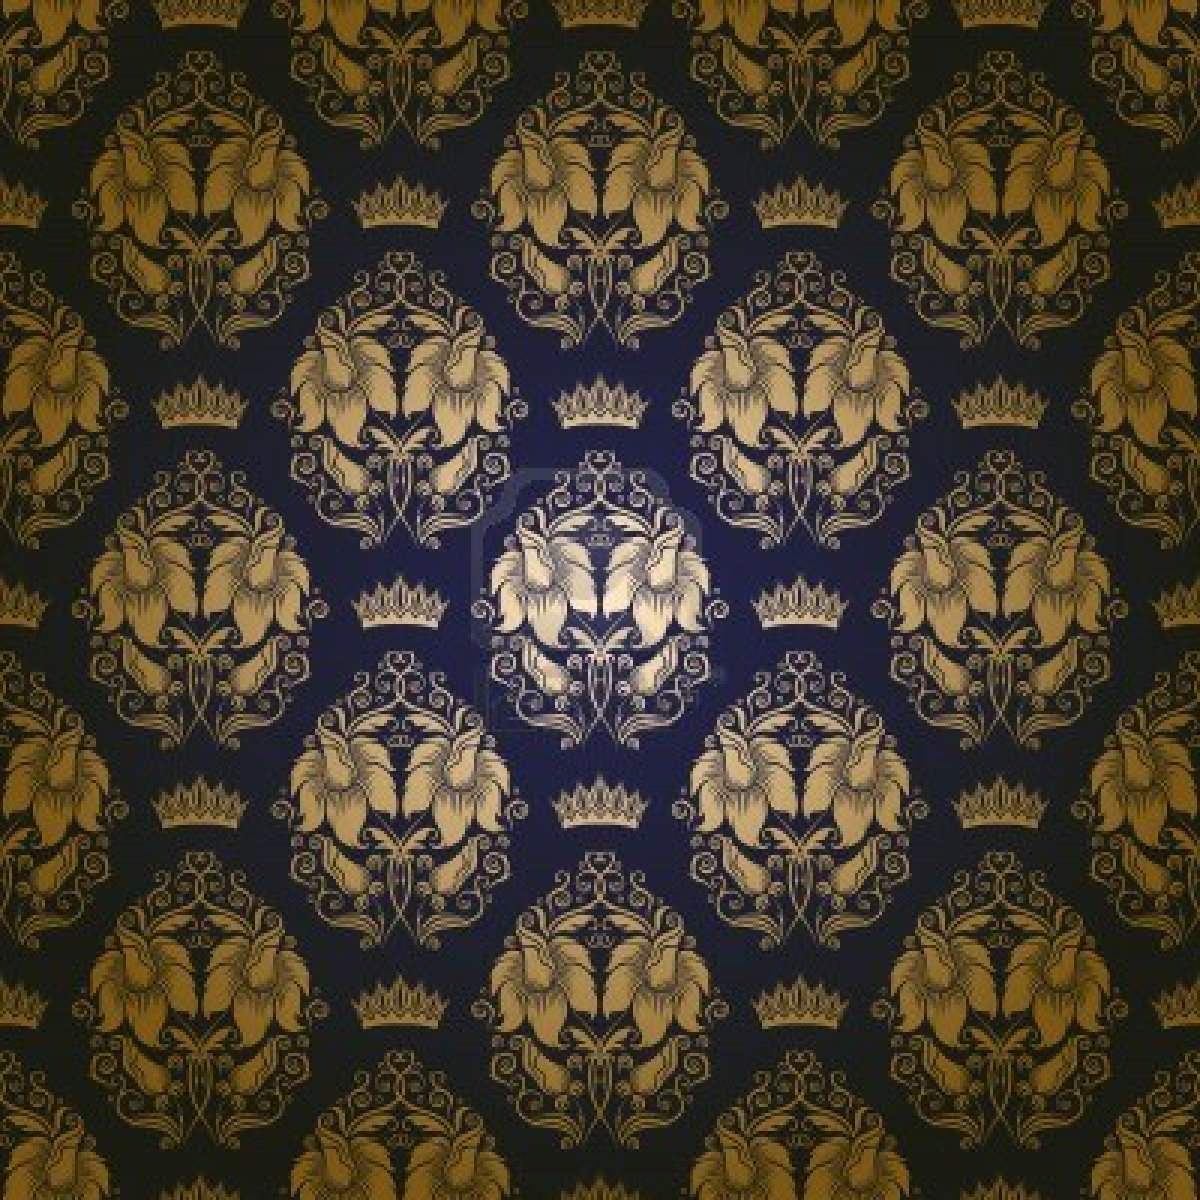 Golden Flowers Pattern Wallpapers   First HD Wallpapers 1200x1200